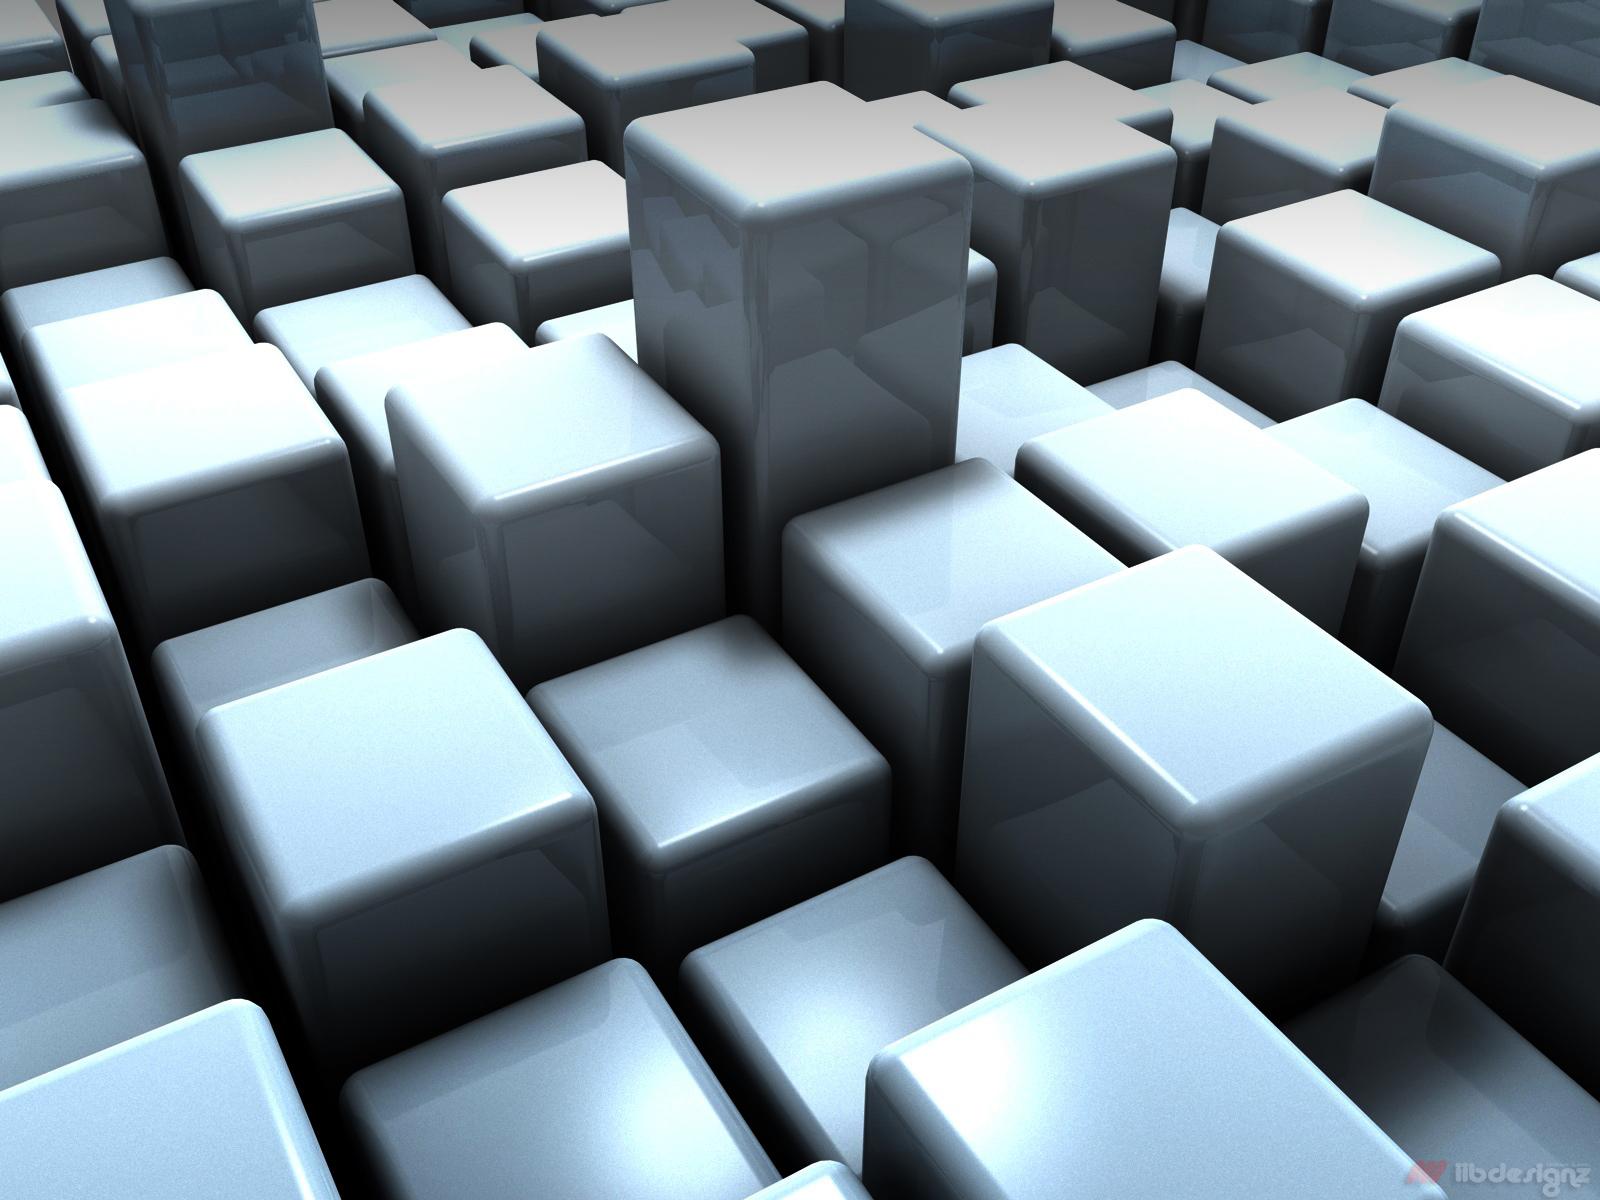 cubes 1024x768 3d wallpaper 3d cubes 1024x768 3d wallpaper wallpaper 1600x1200